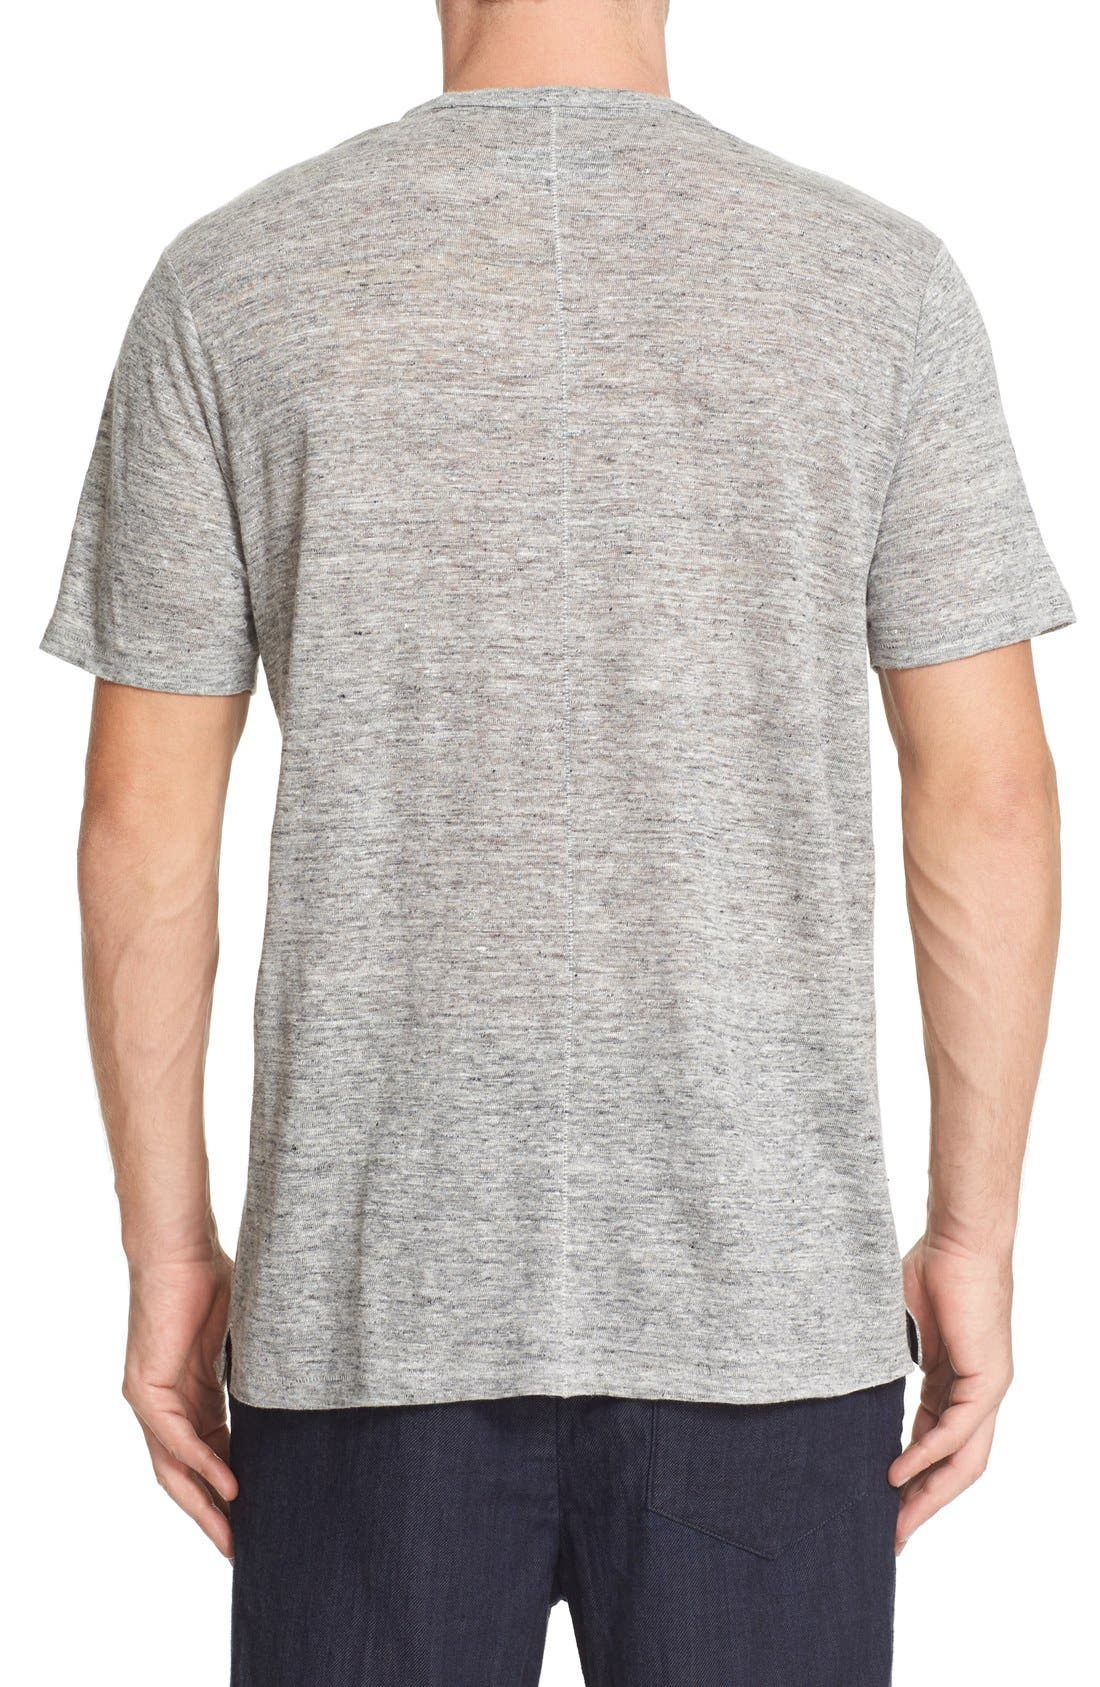 Alternate Image 2  - rag & bone Owen Slub Linen T-Shirt